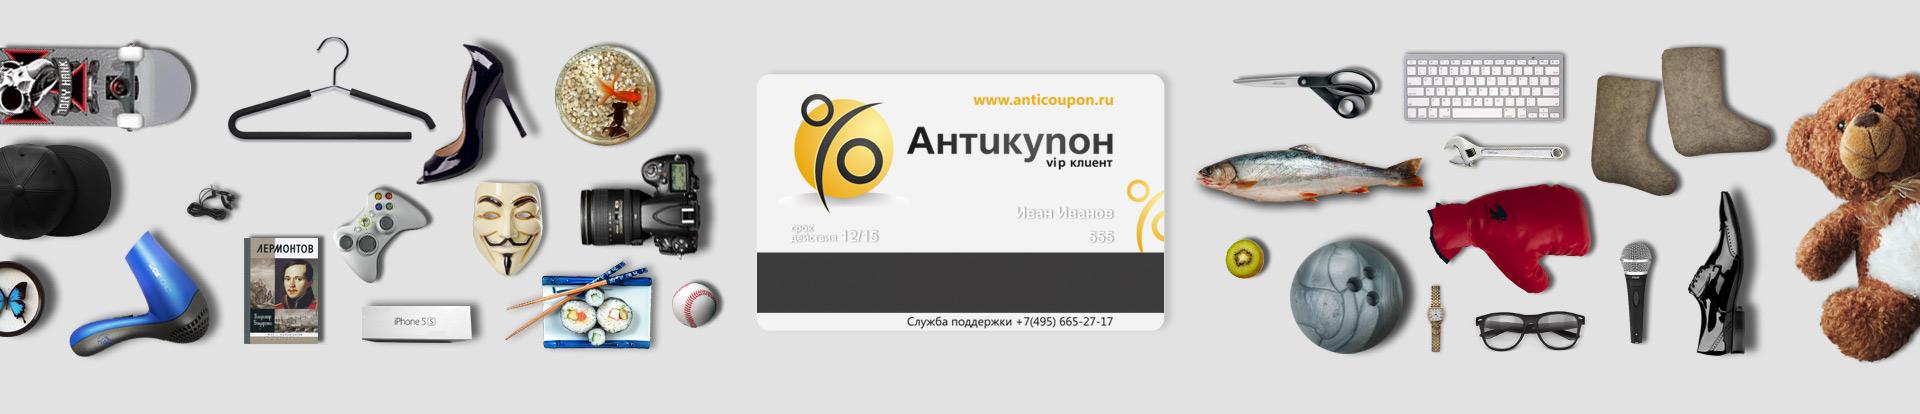 Антикупон-разработка-фирменного-стиля-компании